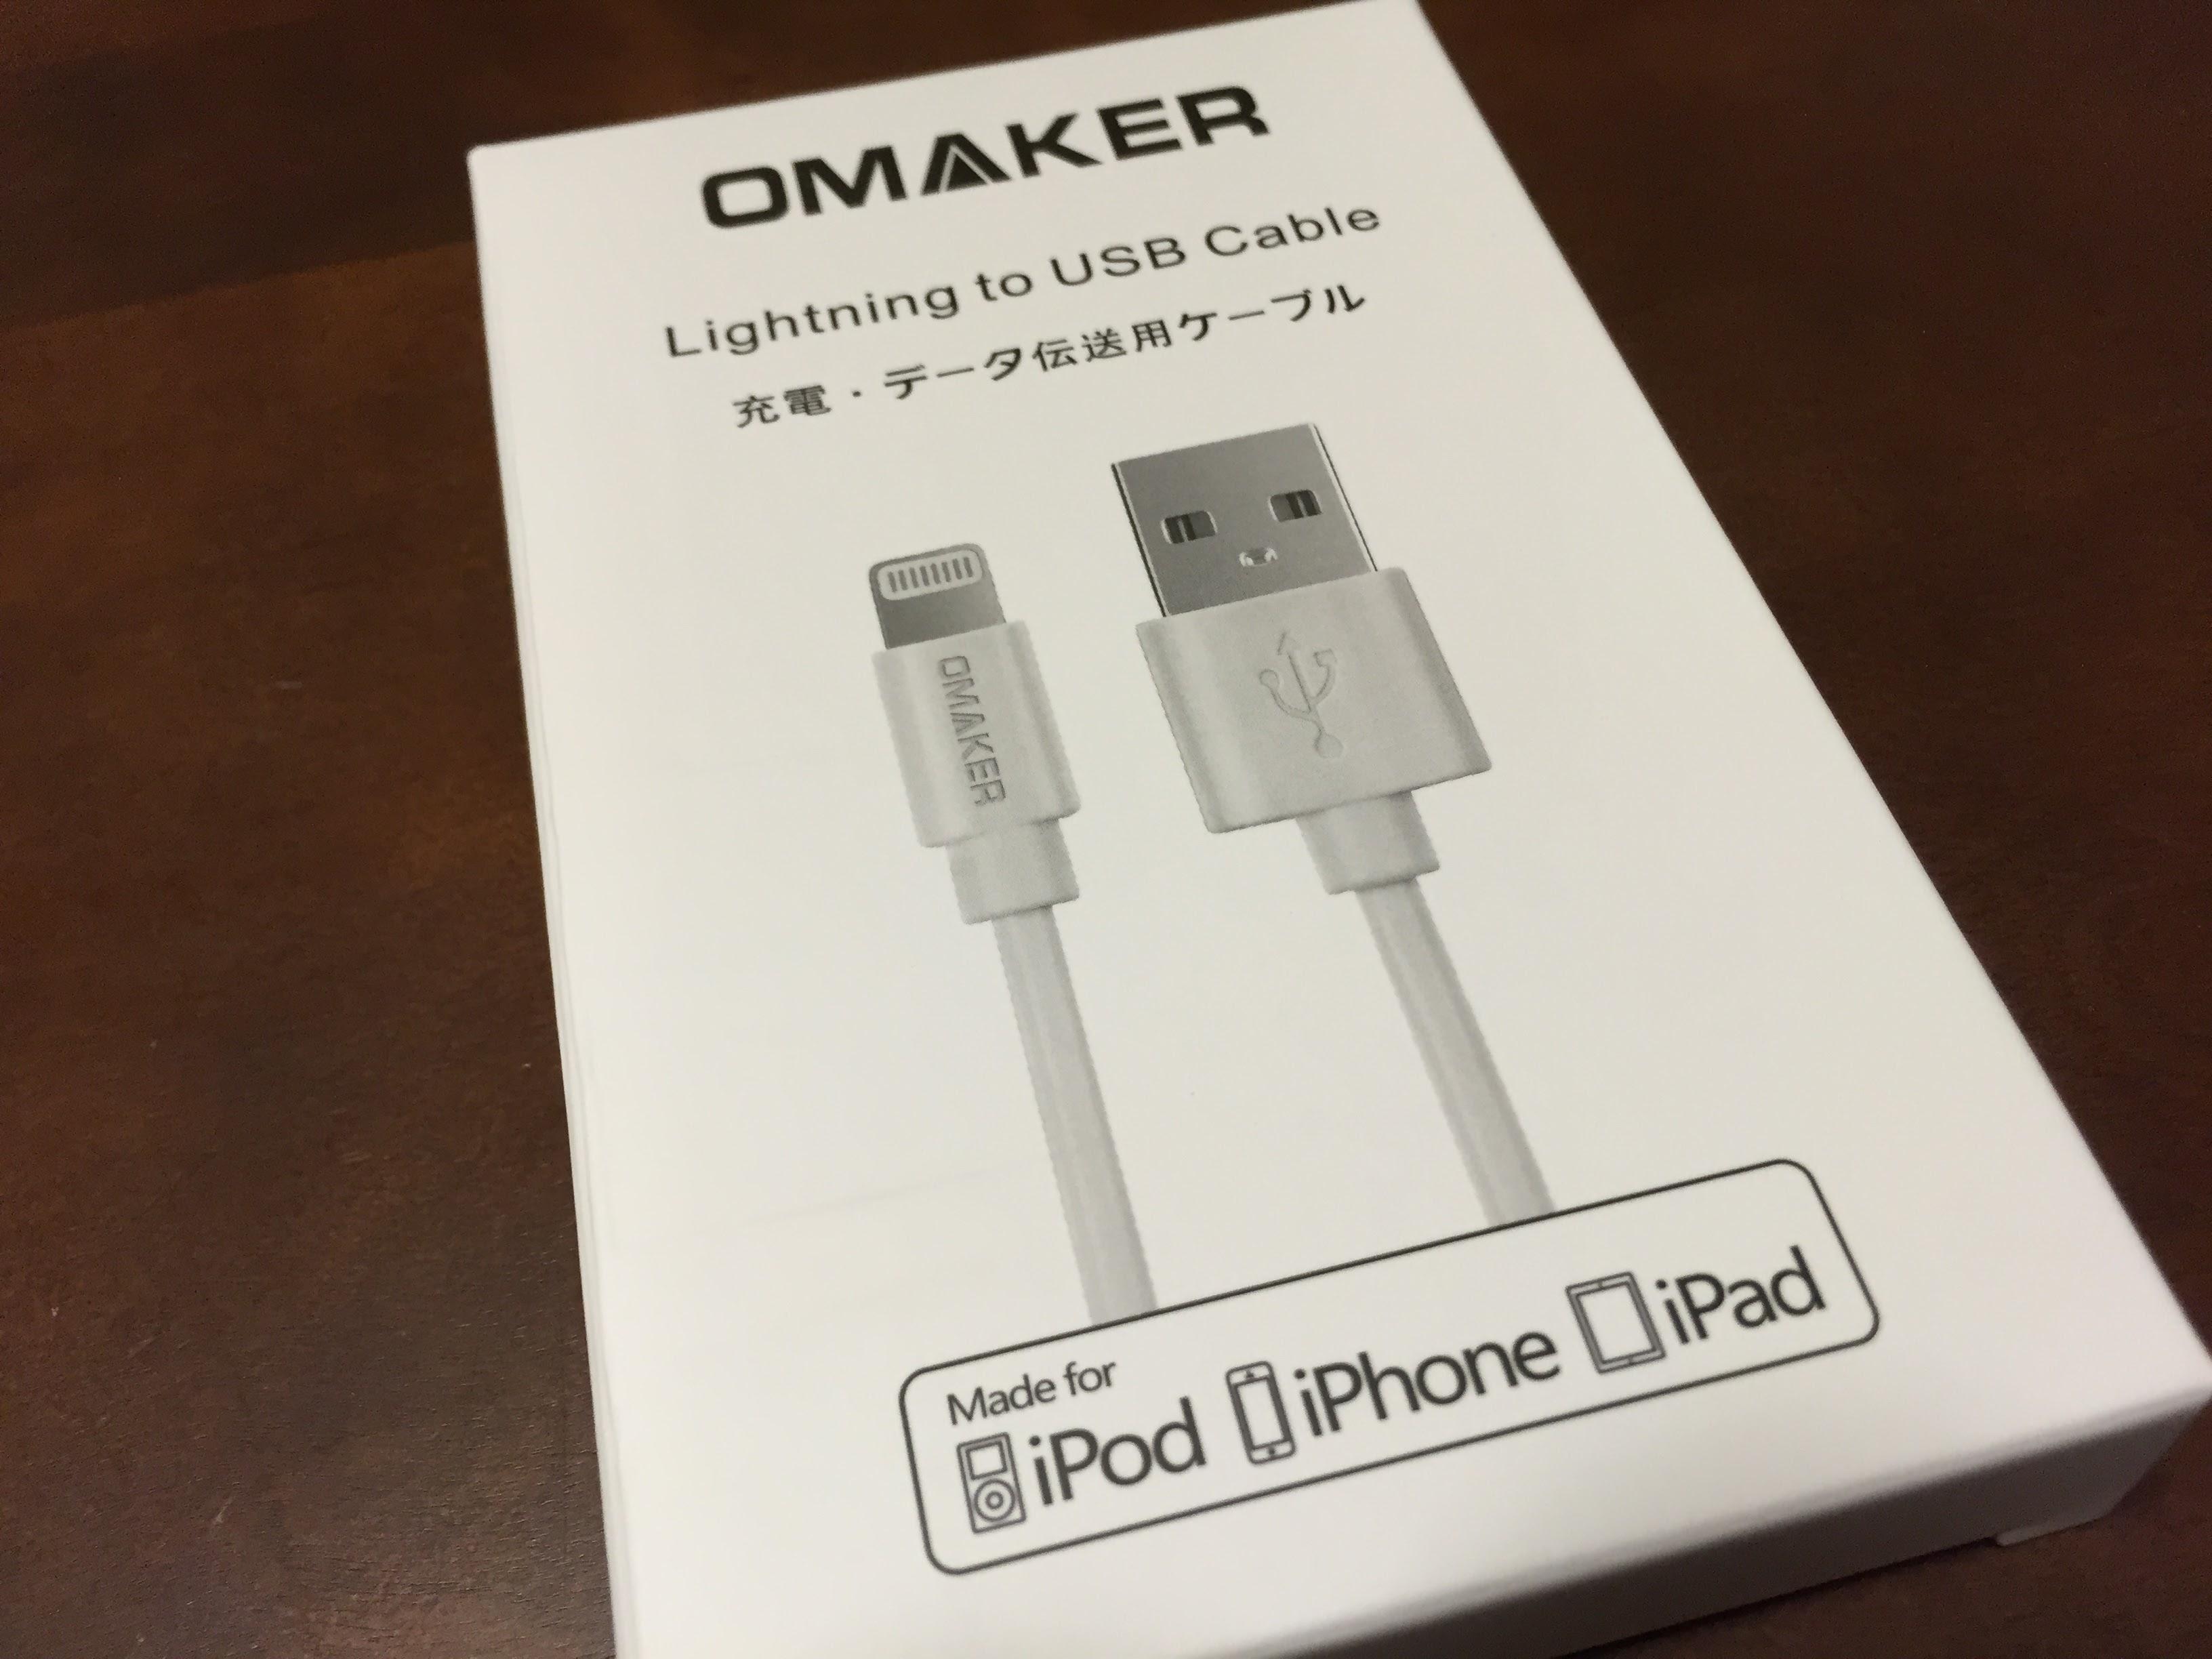 0918-201507_Omaker Lightning Cable 01